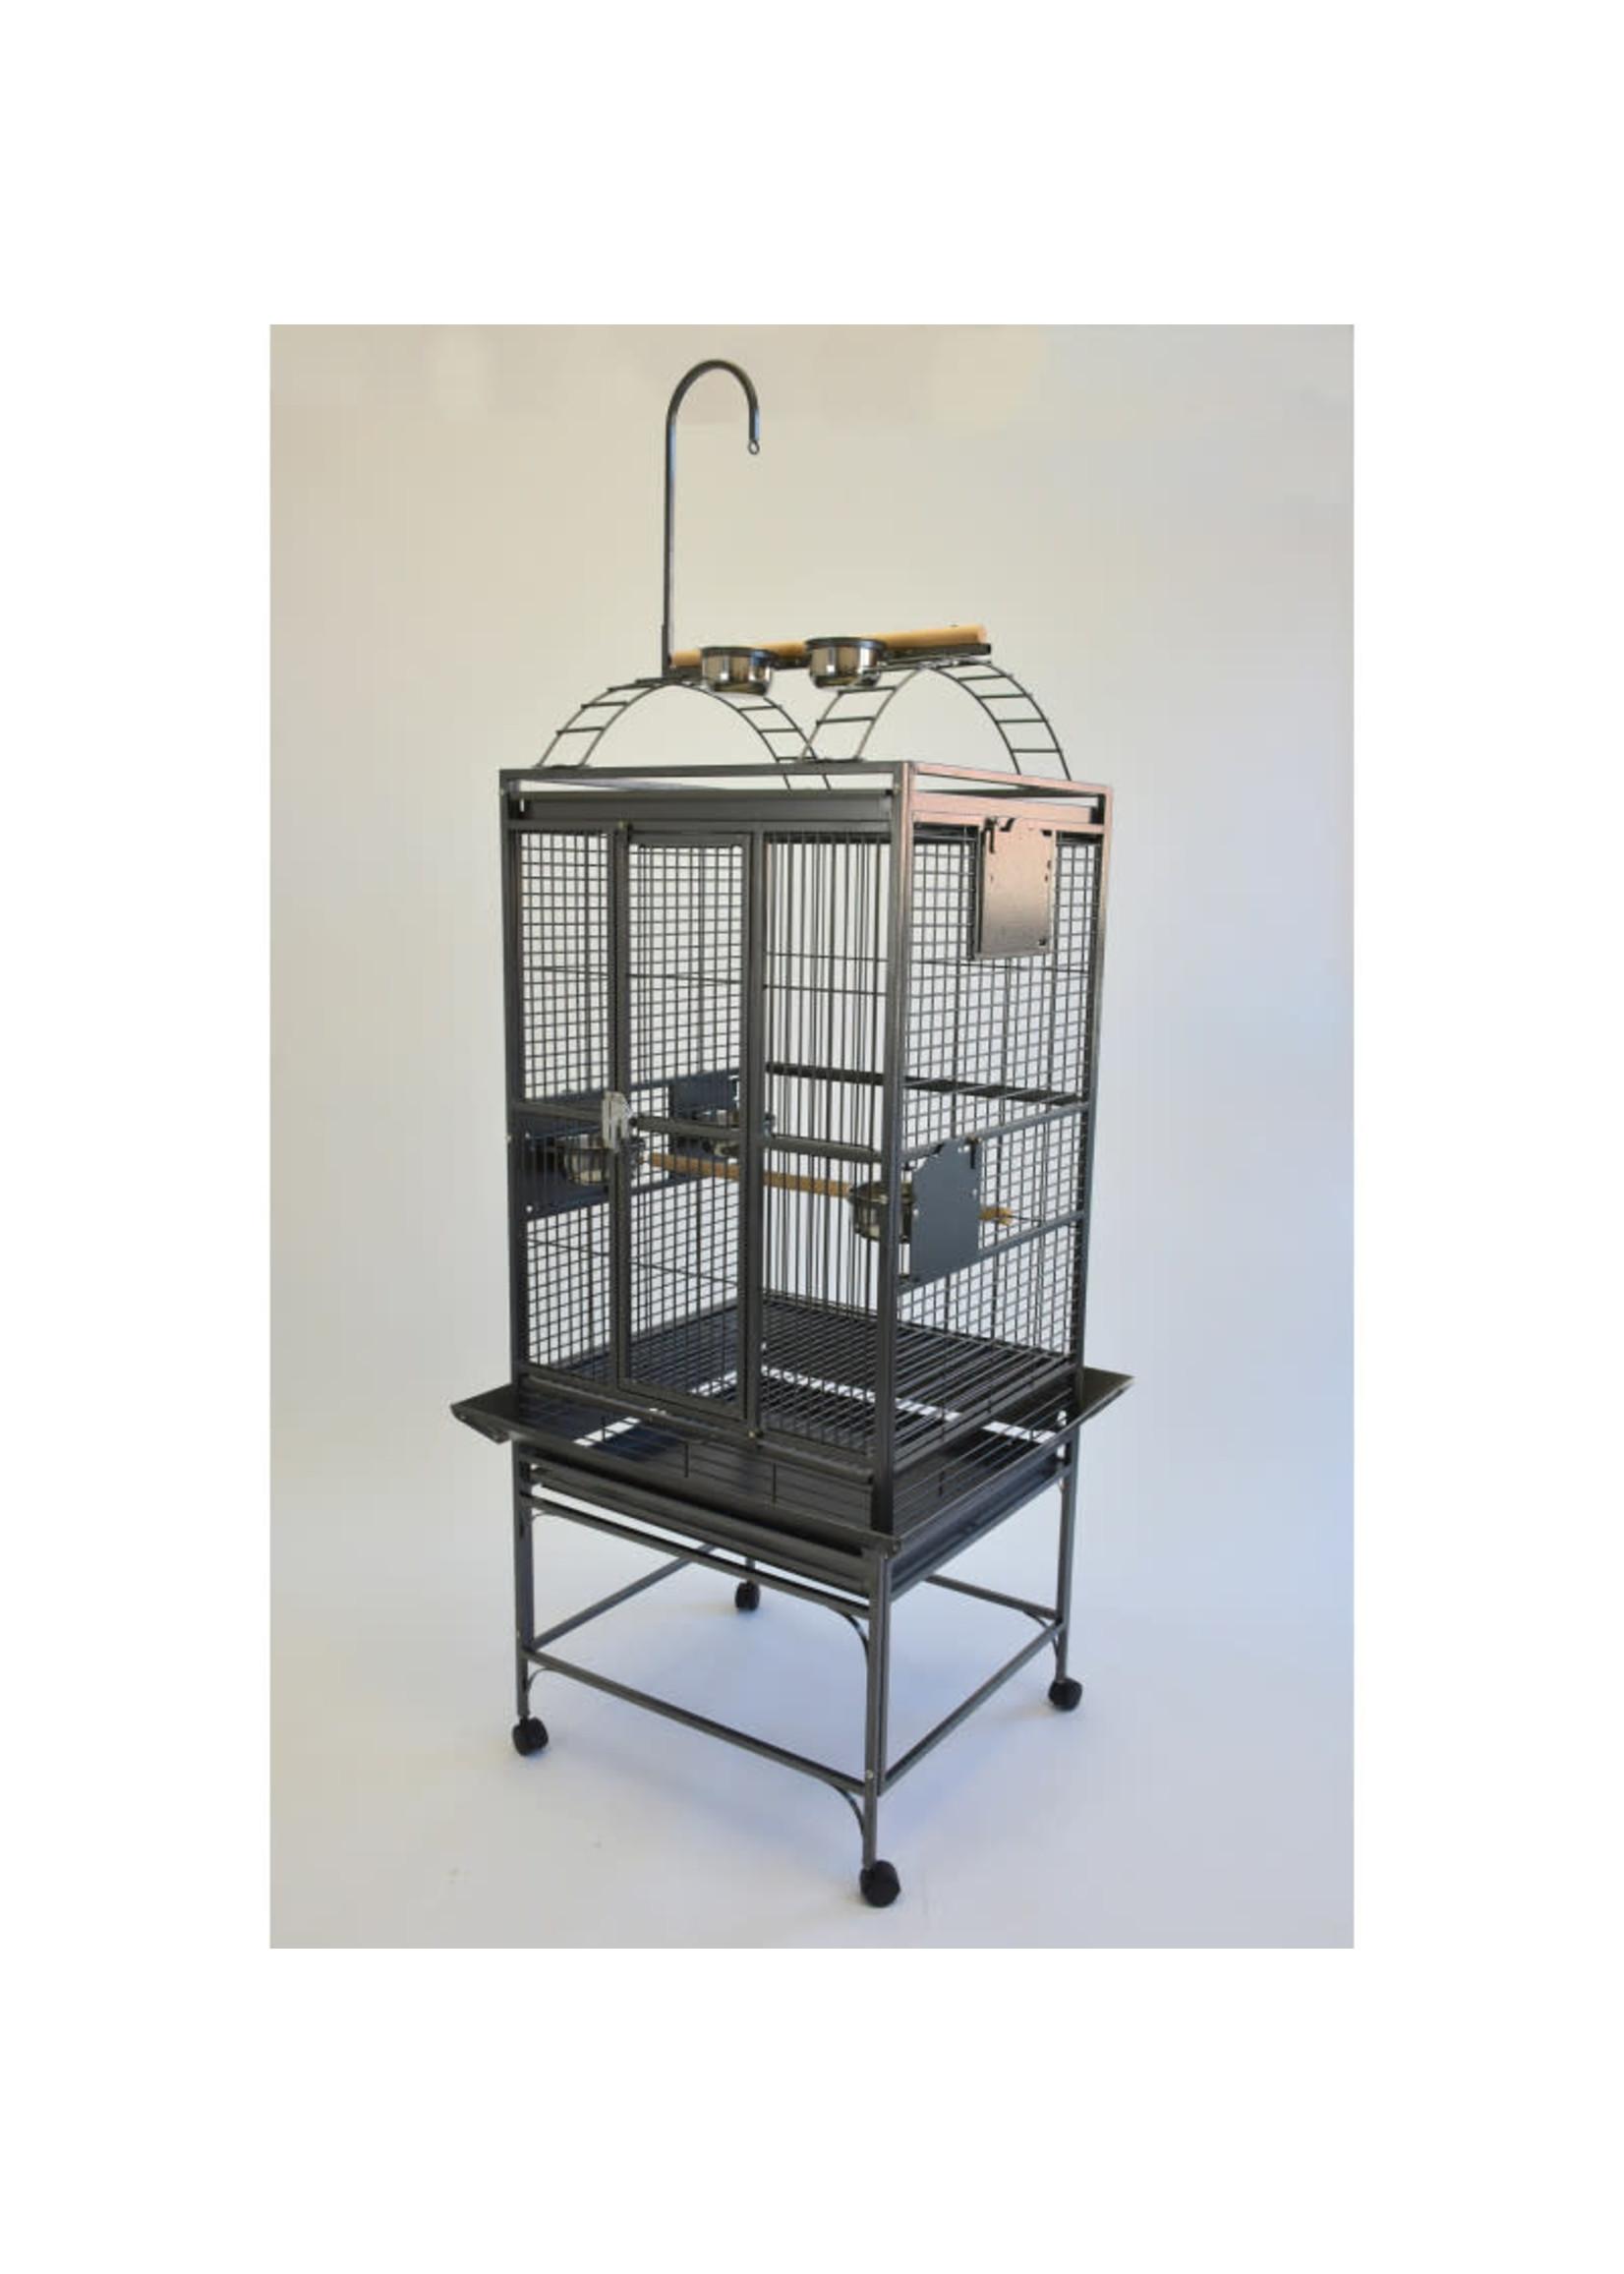 Glitter Pets GP Playtop Cage 24''x22'' Black